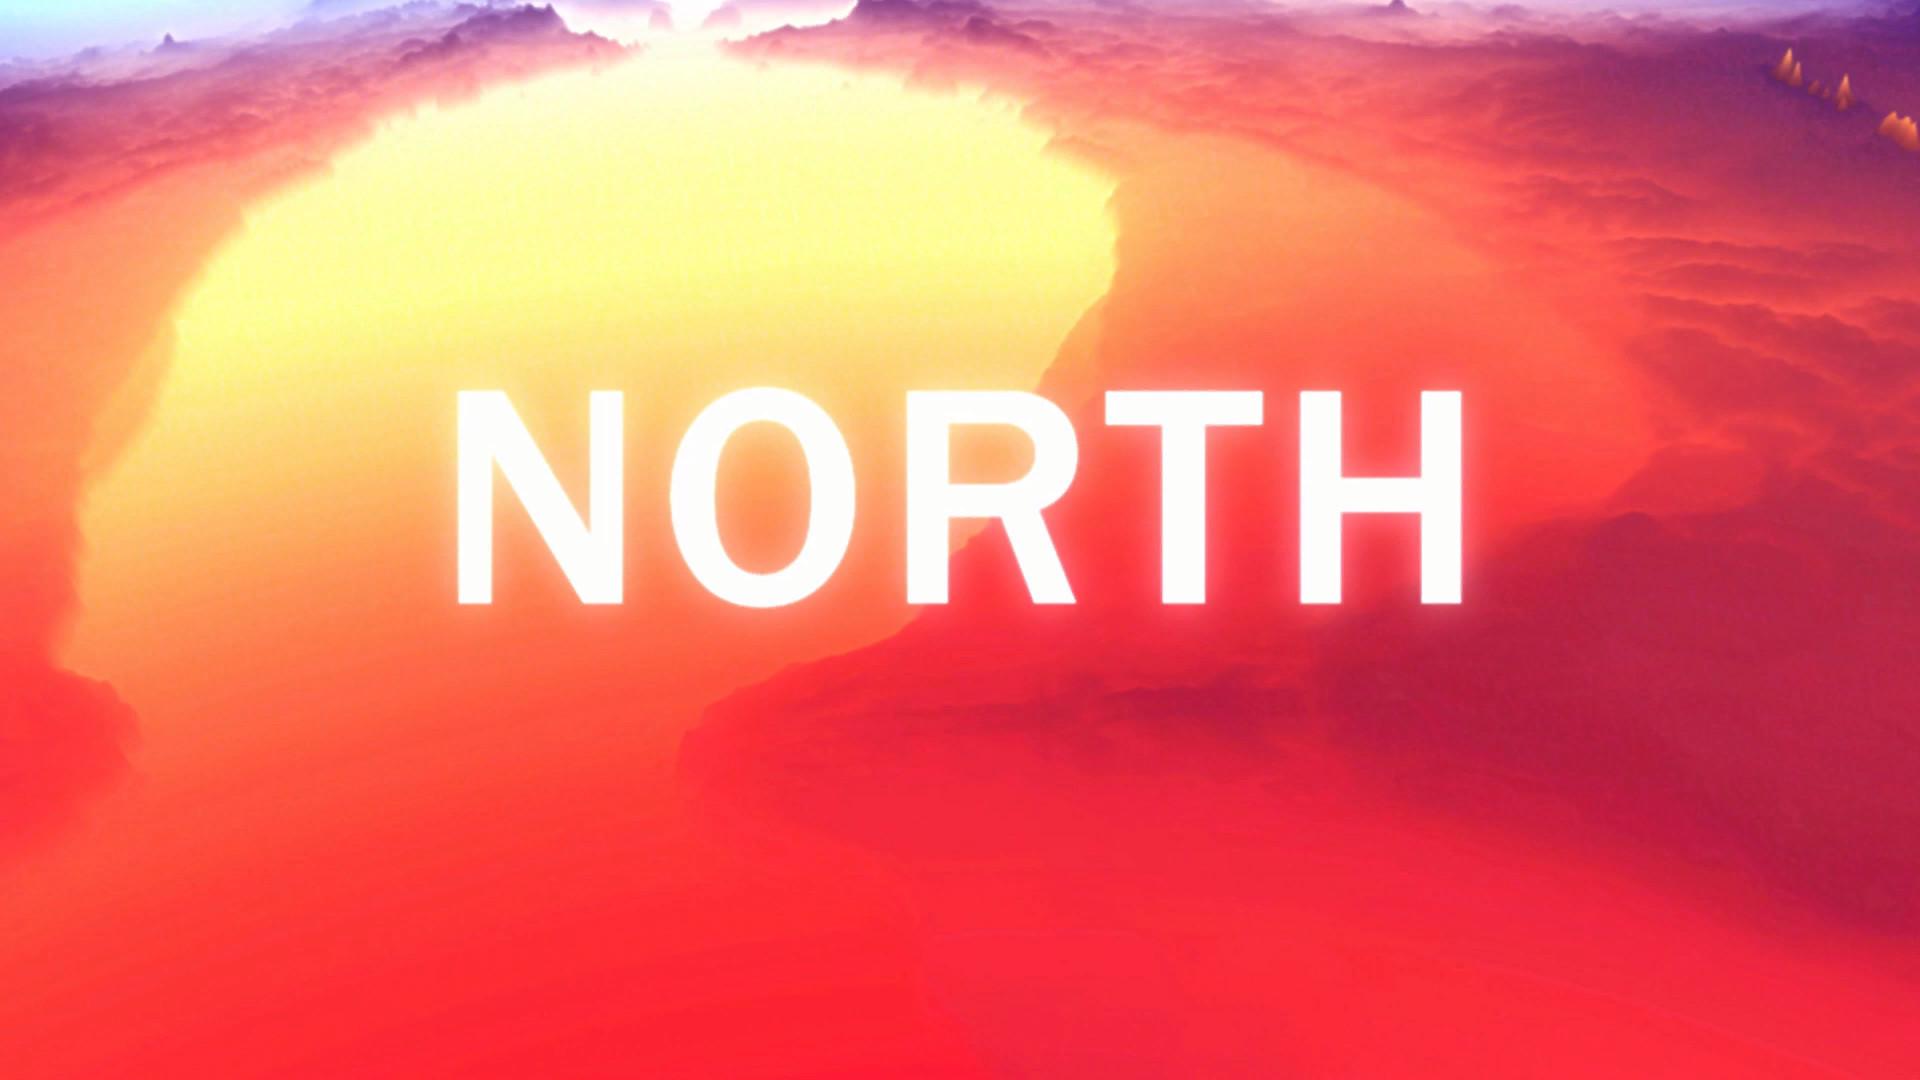 NORTH_20210109015801.jpg